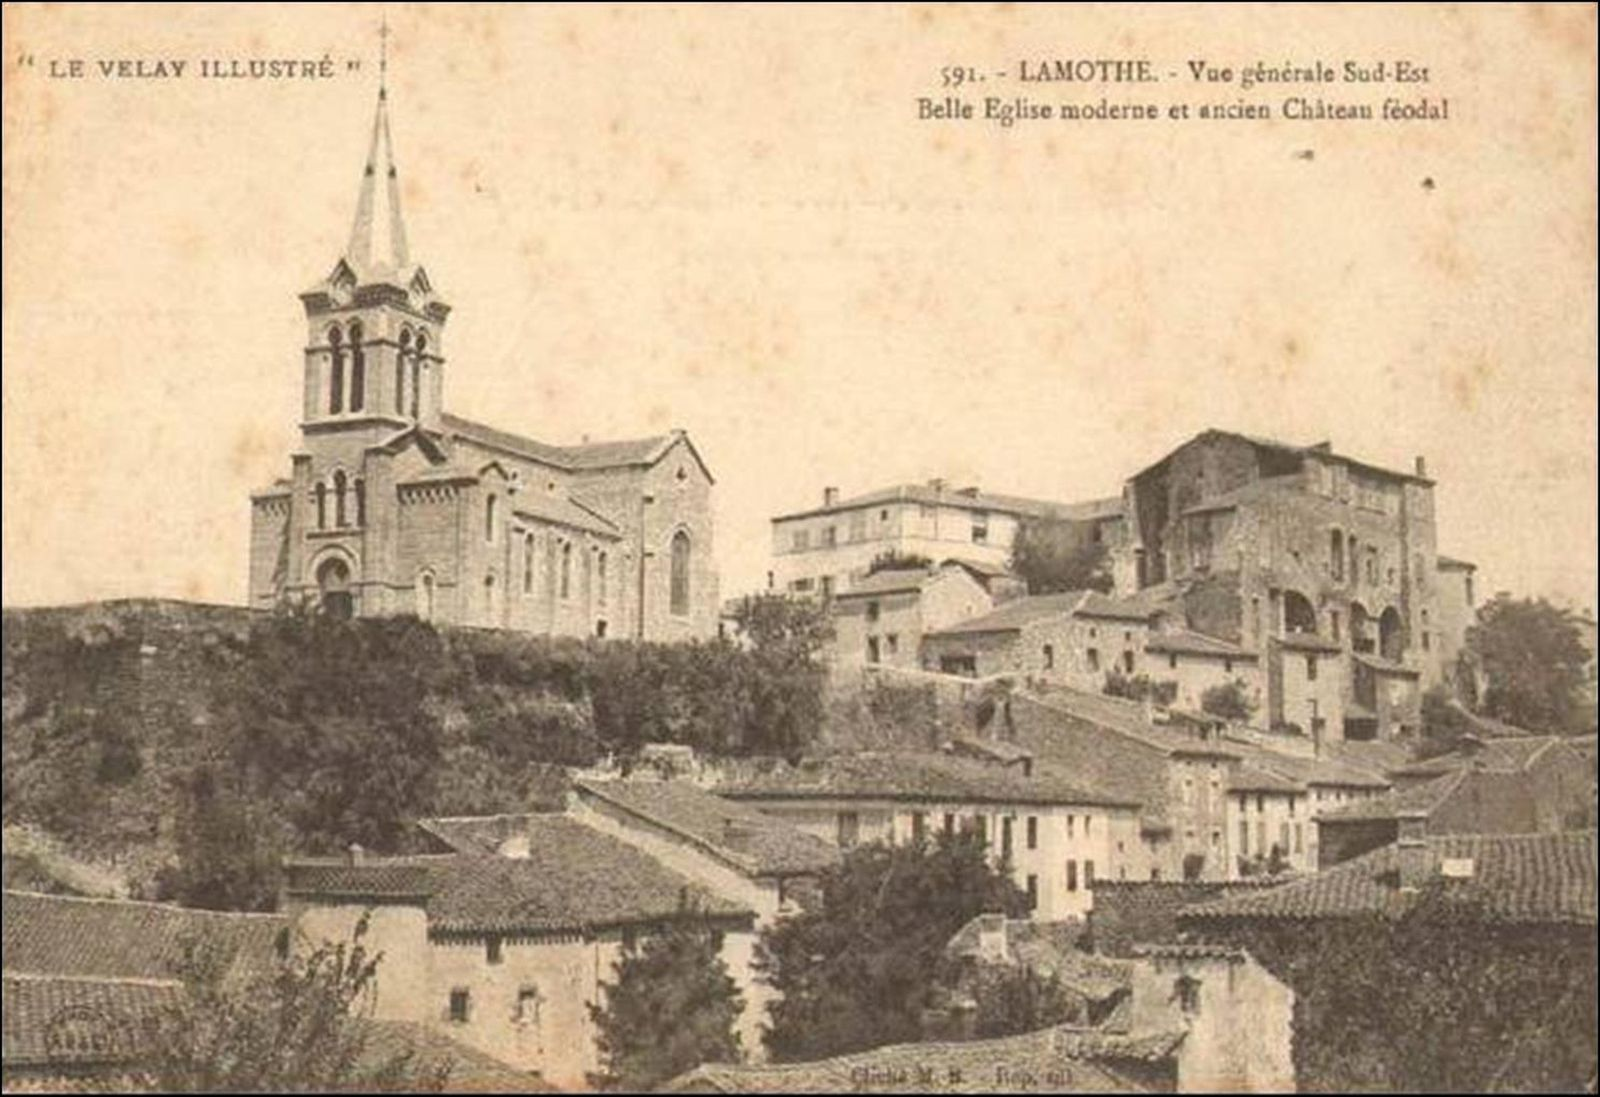 Lamothe 43100